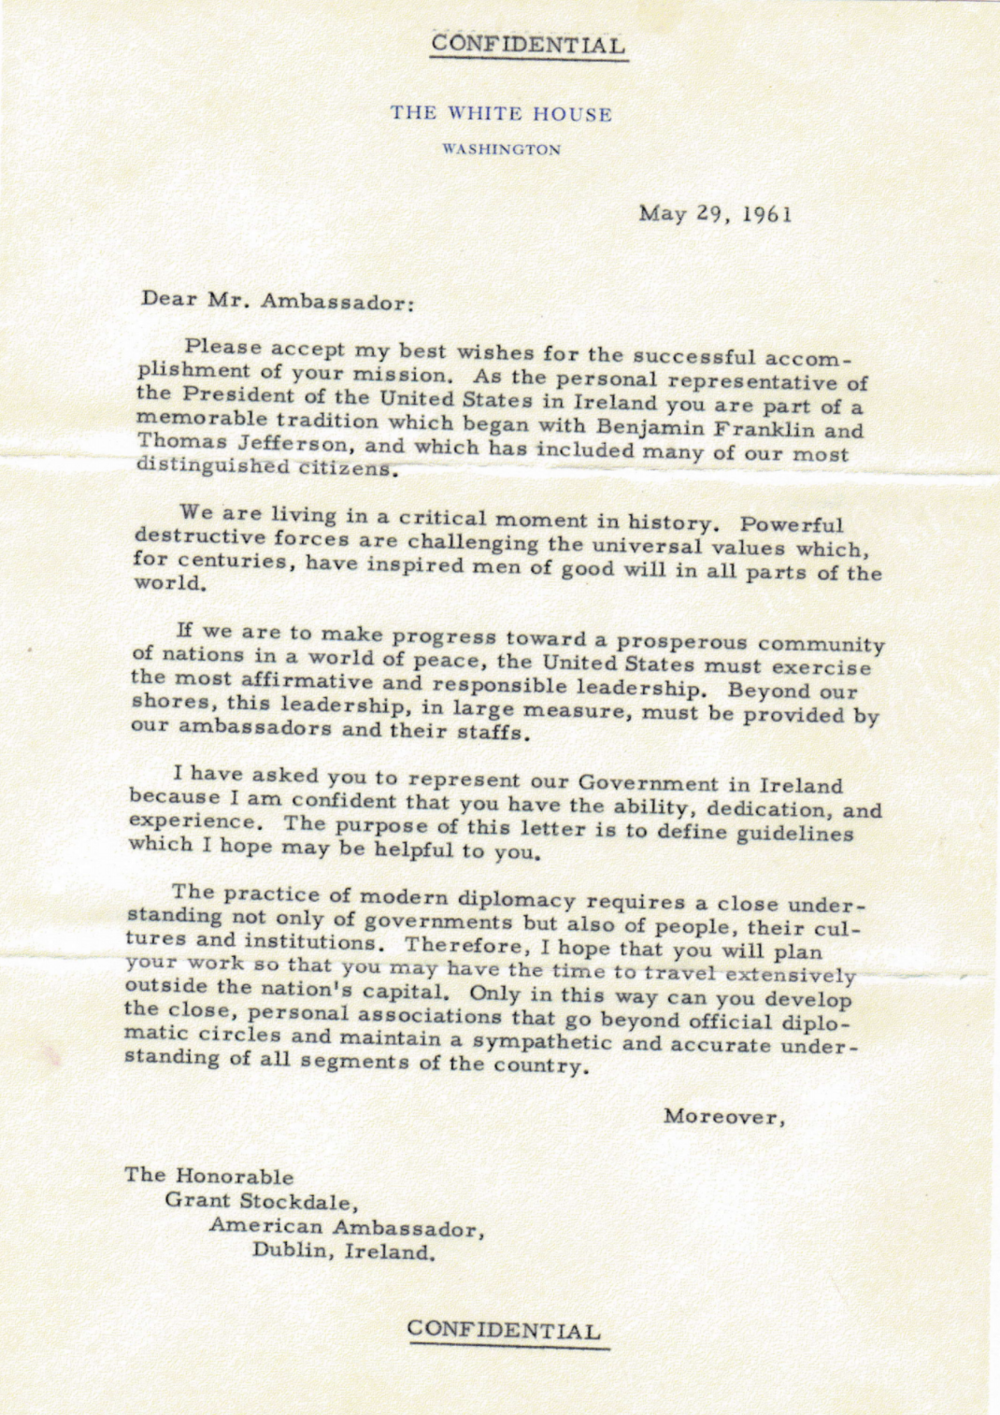 Confidential Letter From President Kennedy Grant Stockdale Archives